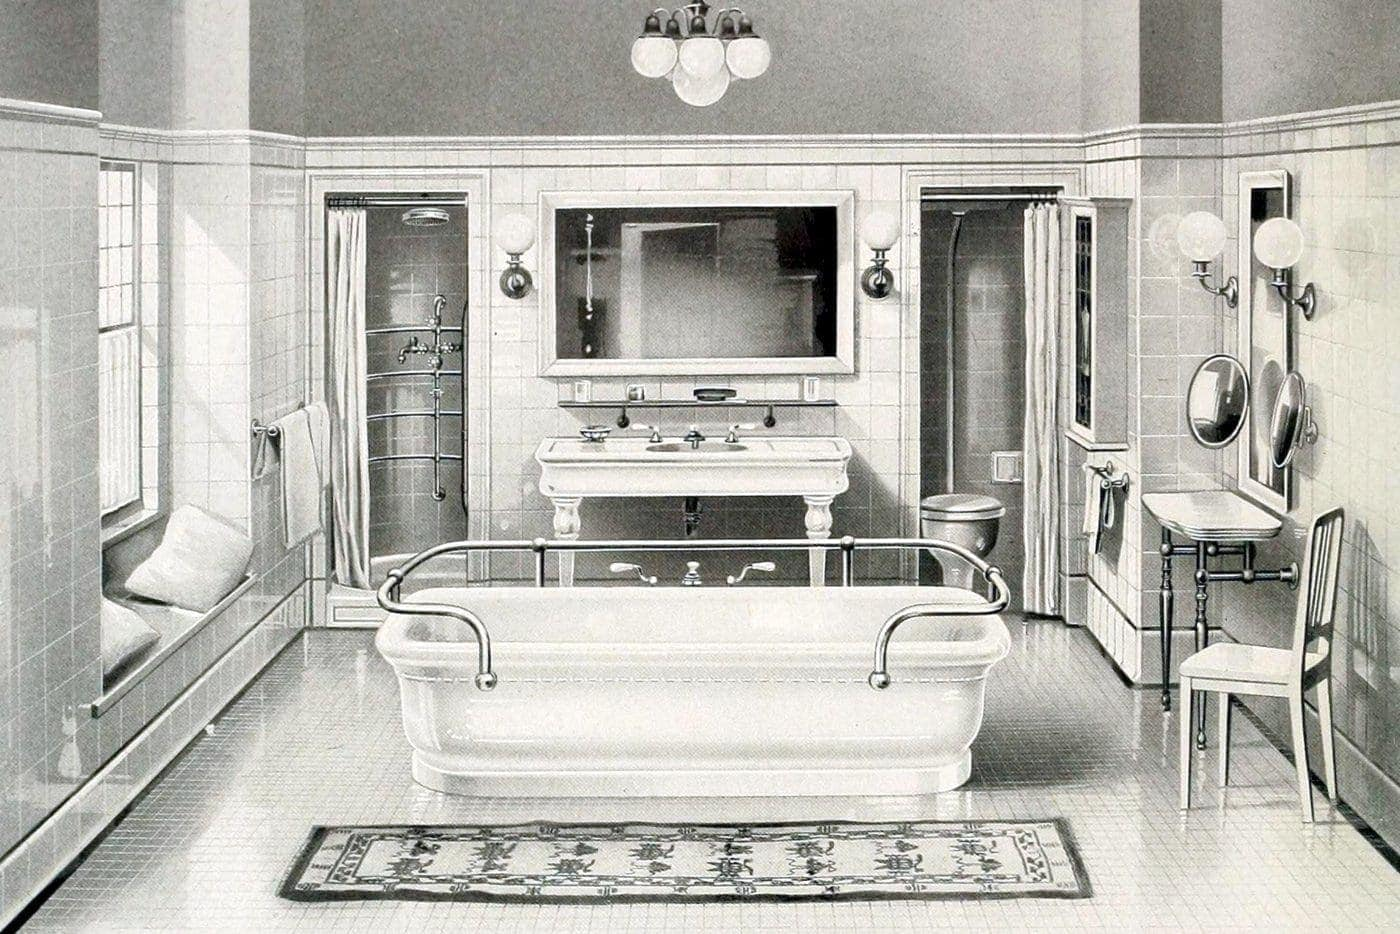 1900s sinks tubs tile decor